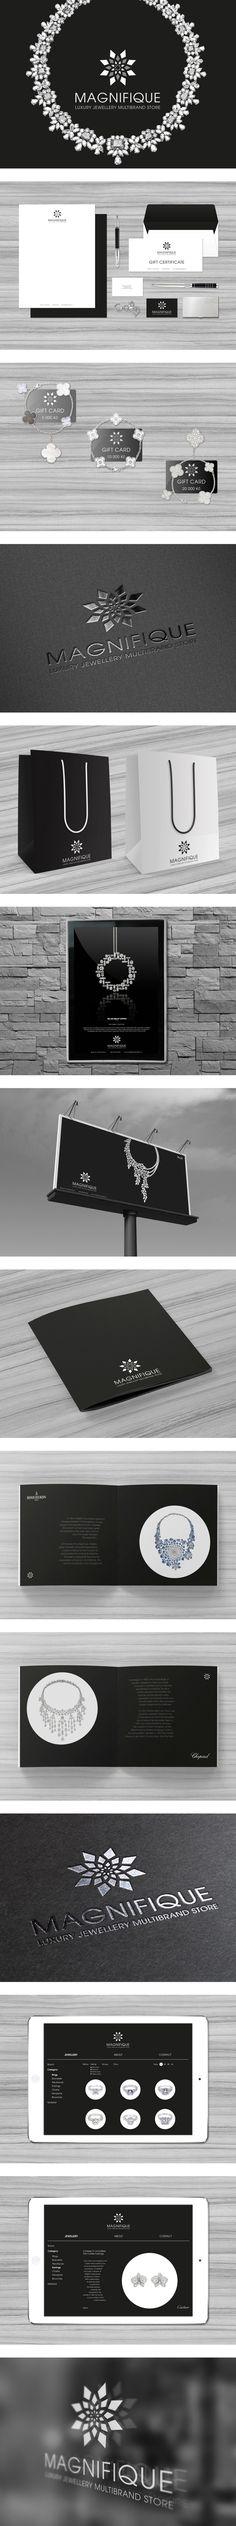 MAGNIFIQUE Luxury Jewellery Multibrand Store by Ven Klement